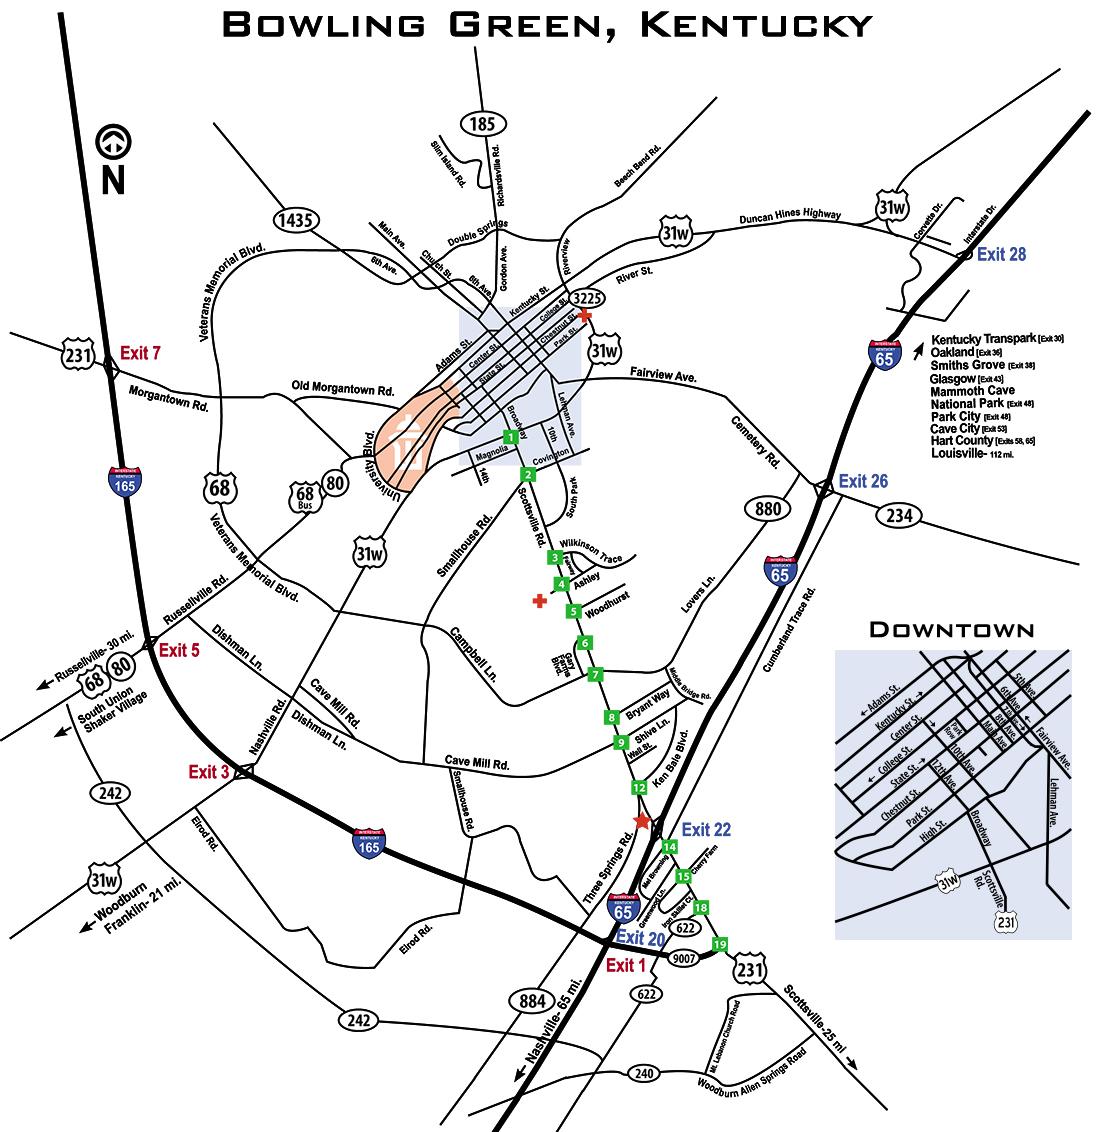 map of bowling green kentucky Maps And Directions Getting Around Bowling Green Ky map of bowling green kentucky